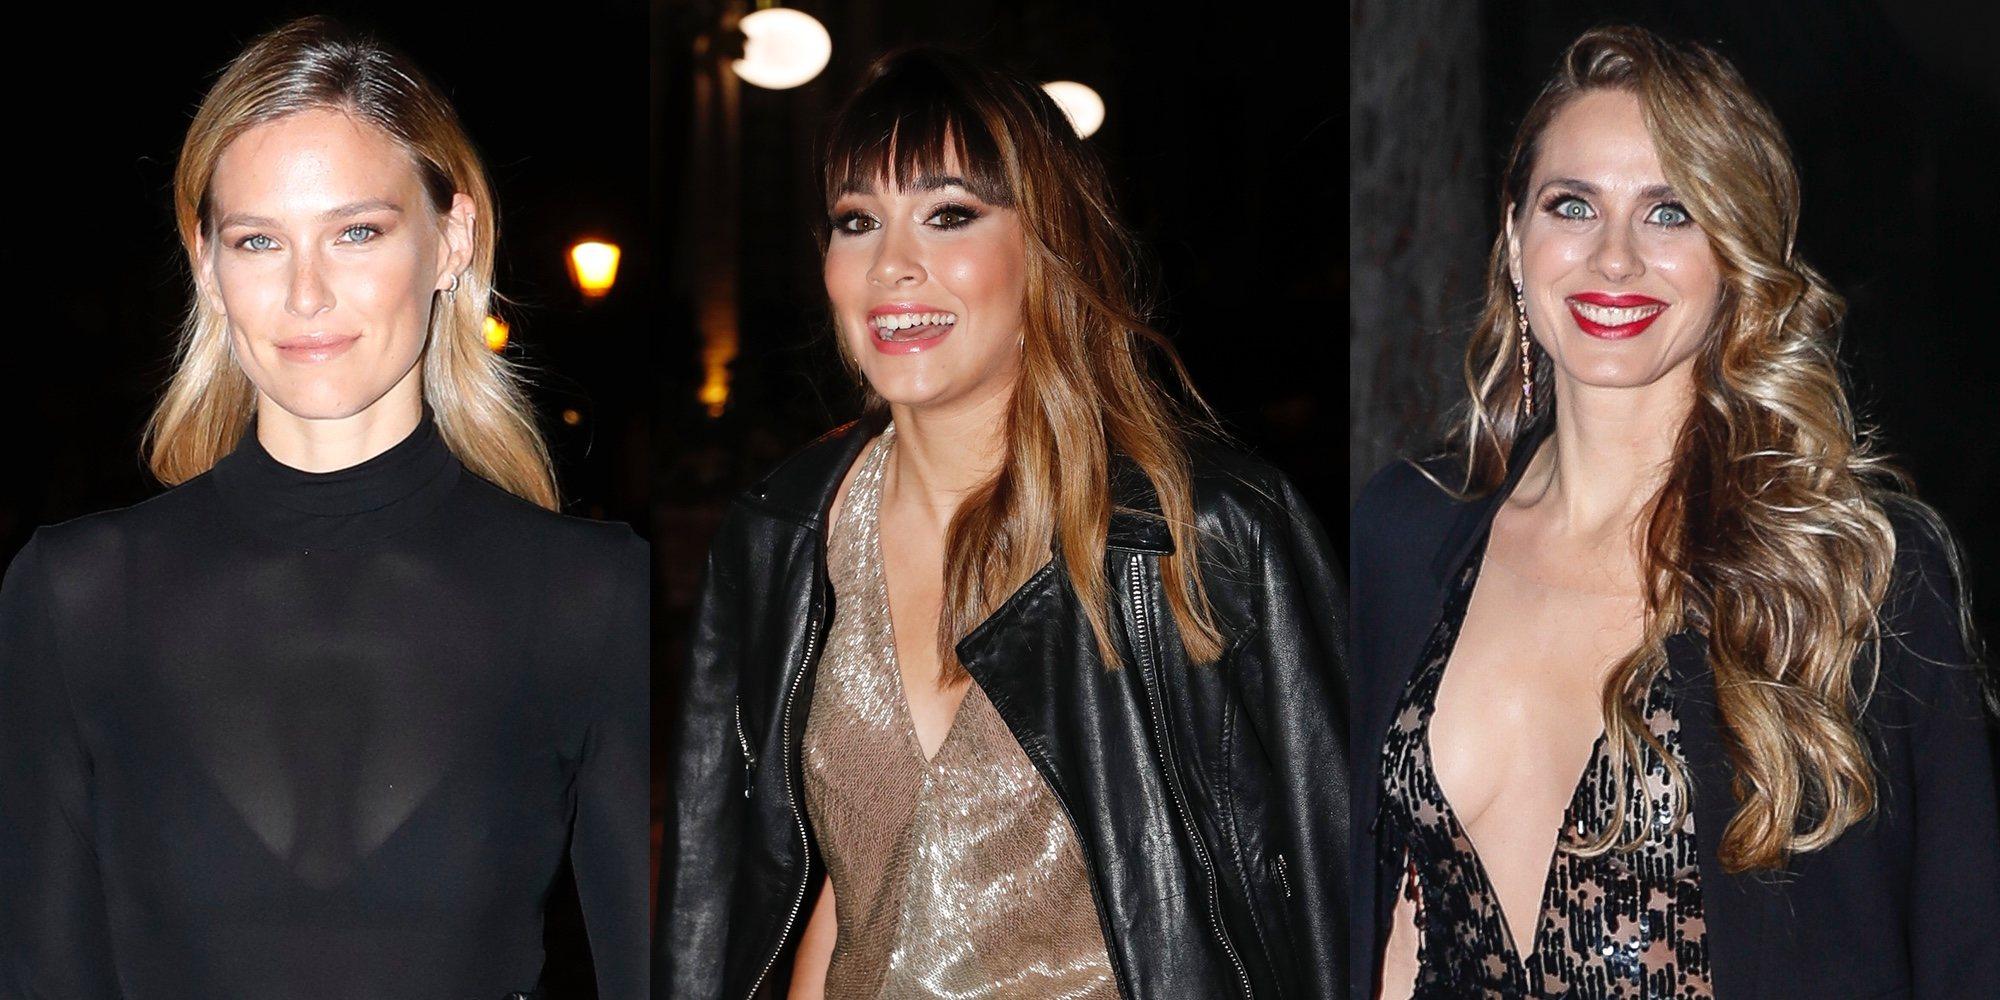 Bar Refaeli, Aitana Ocaña o Vanesa Romero brillan con luz propia en los Premios Cosmopolitan 2018